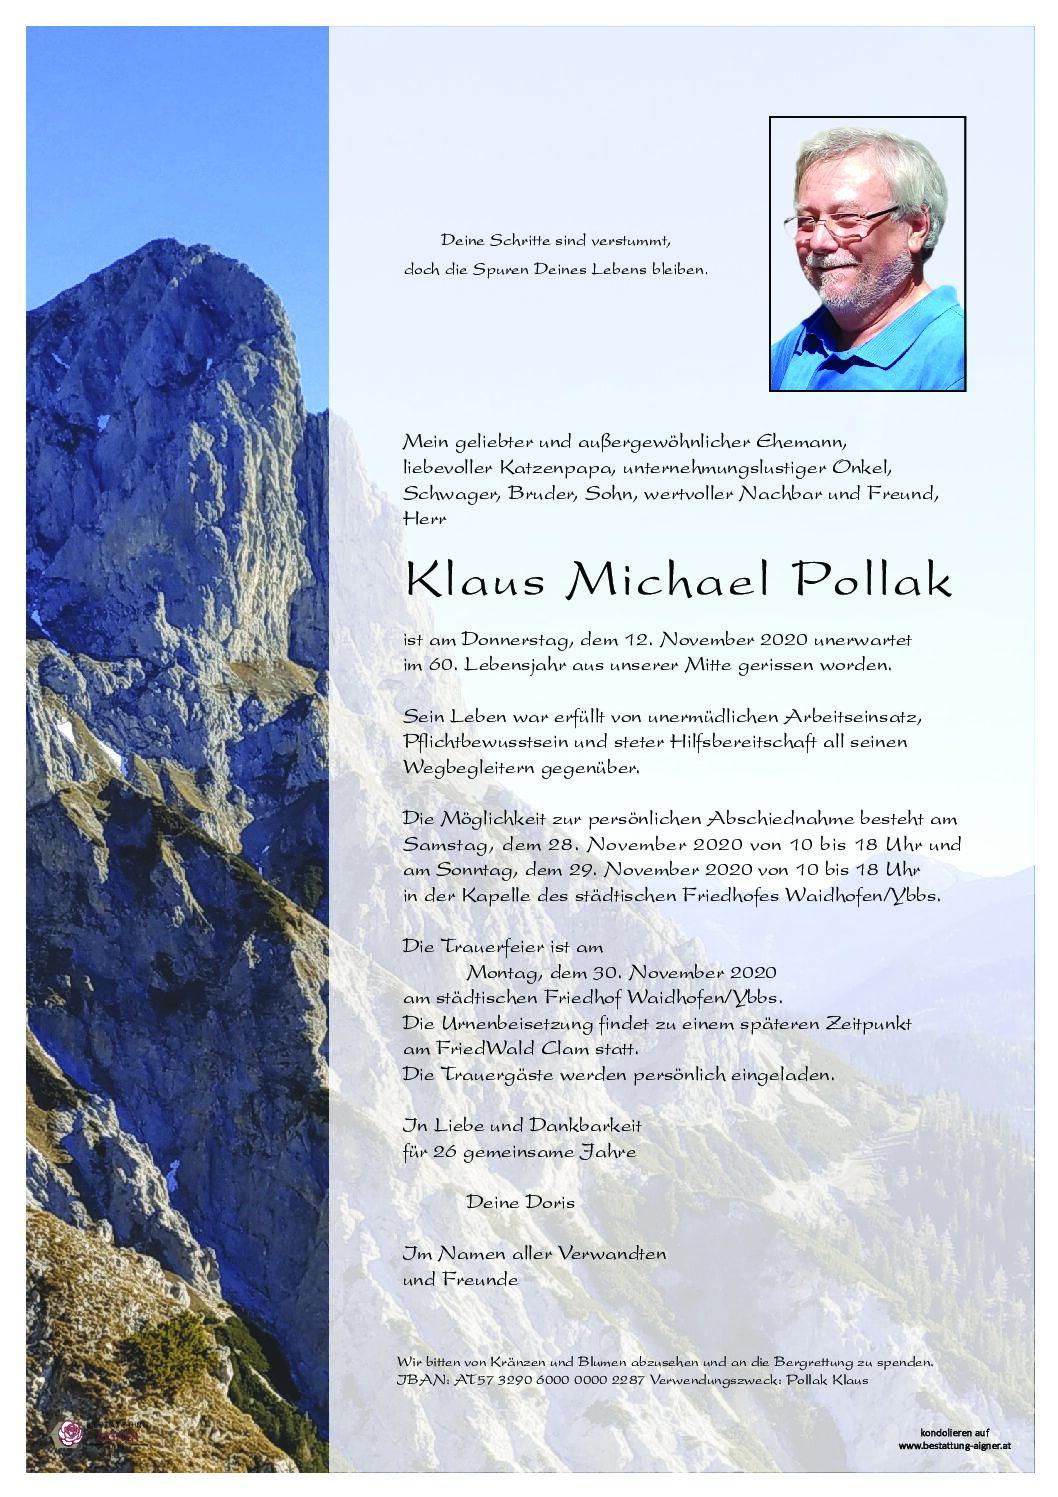 Klaus Michael Pollak